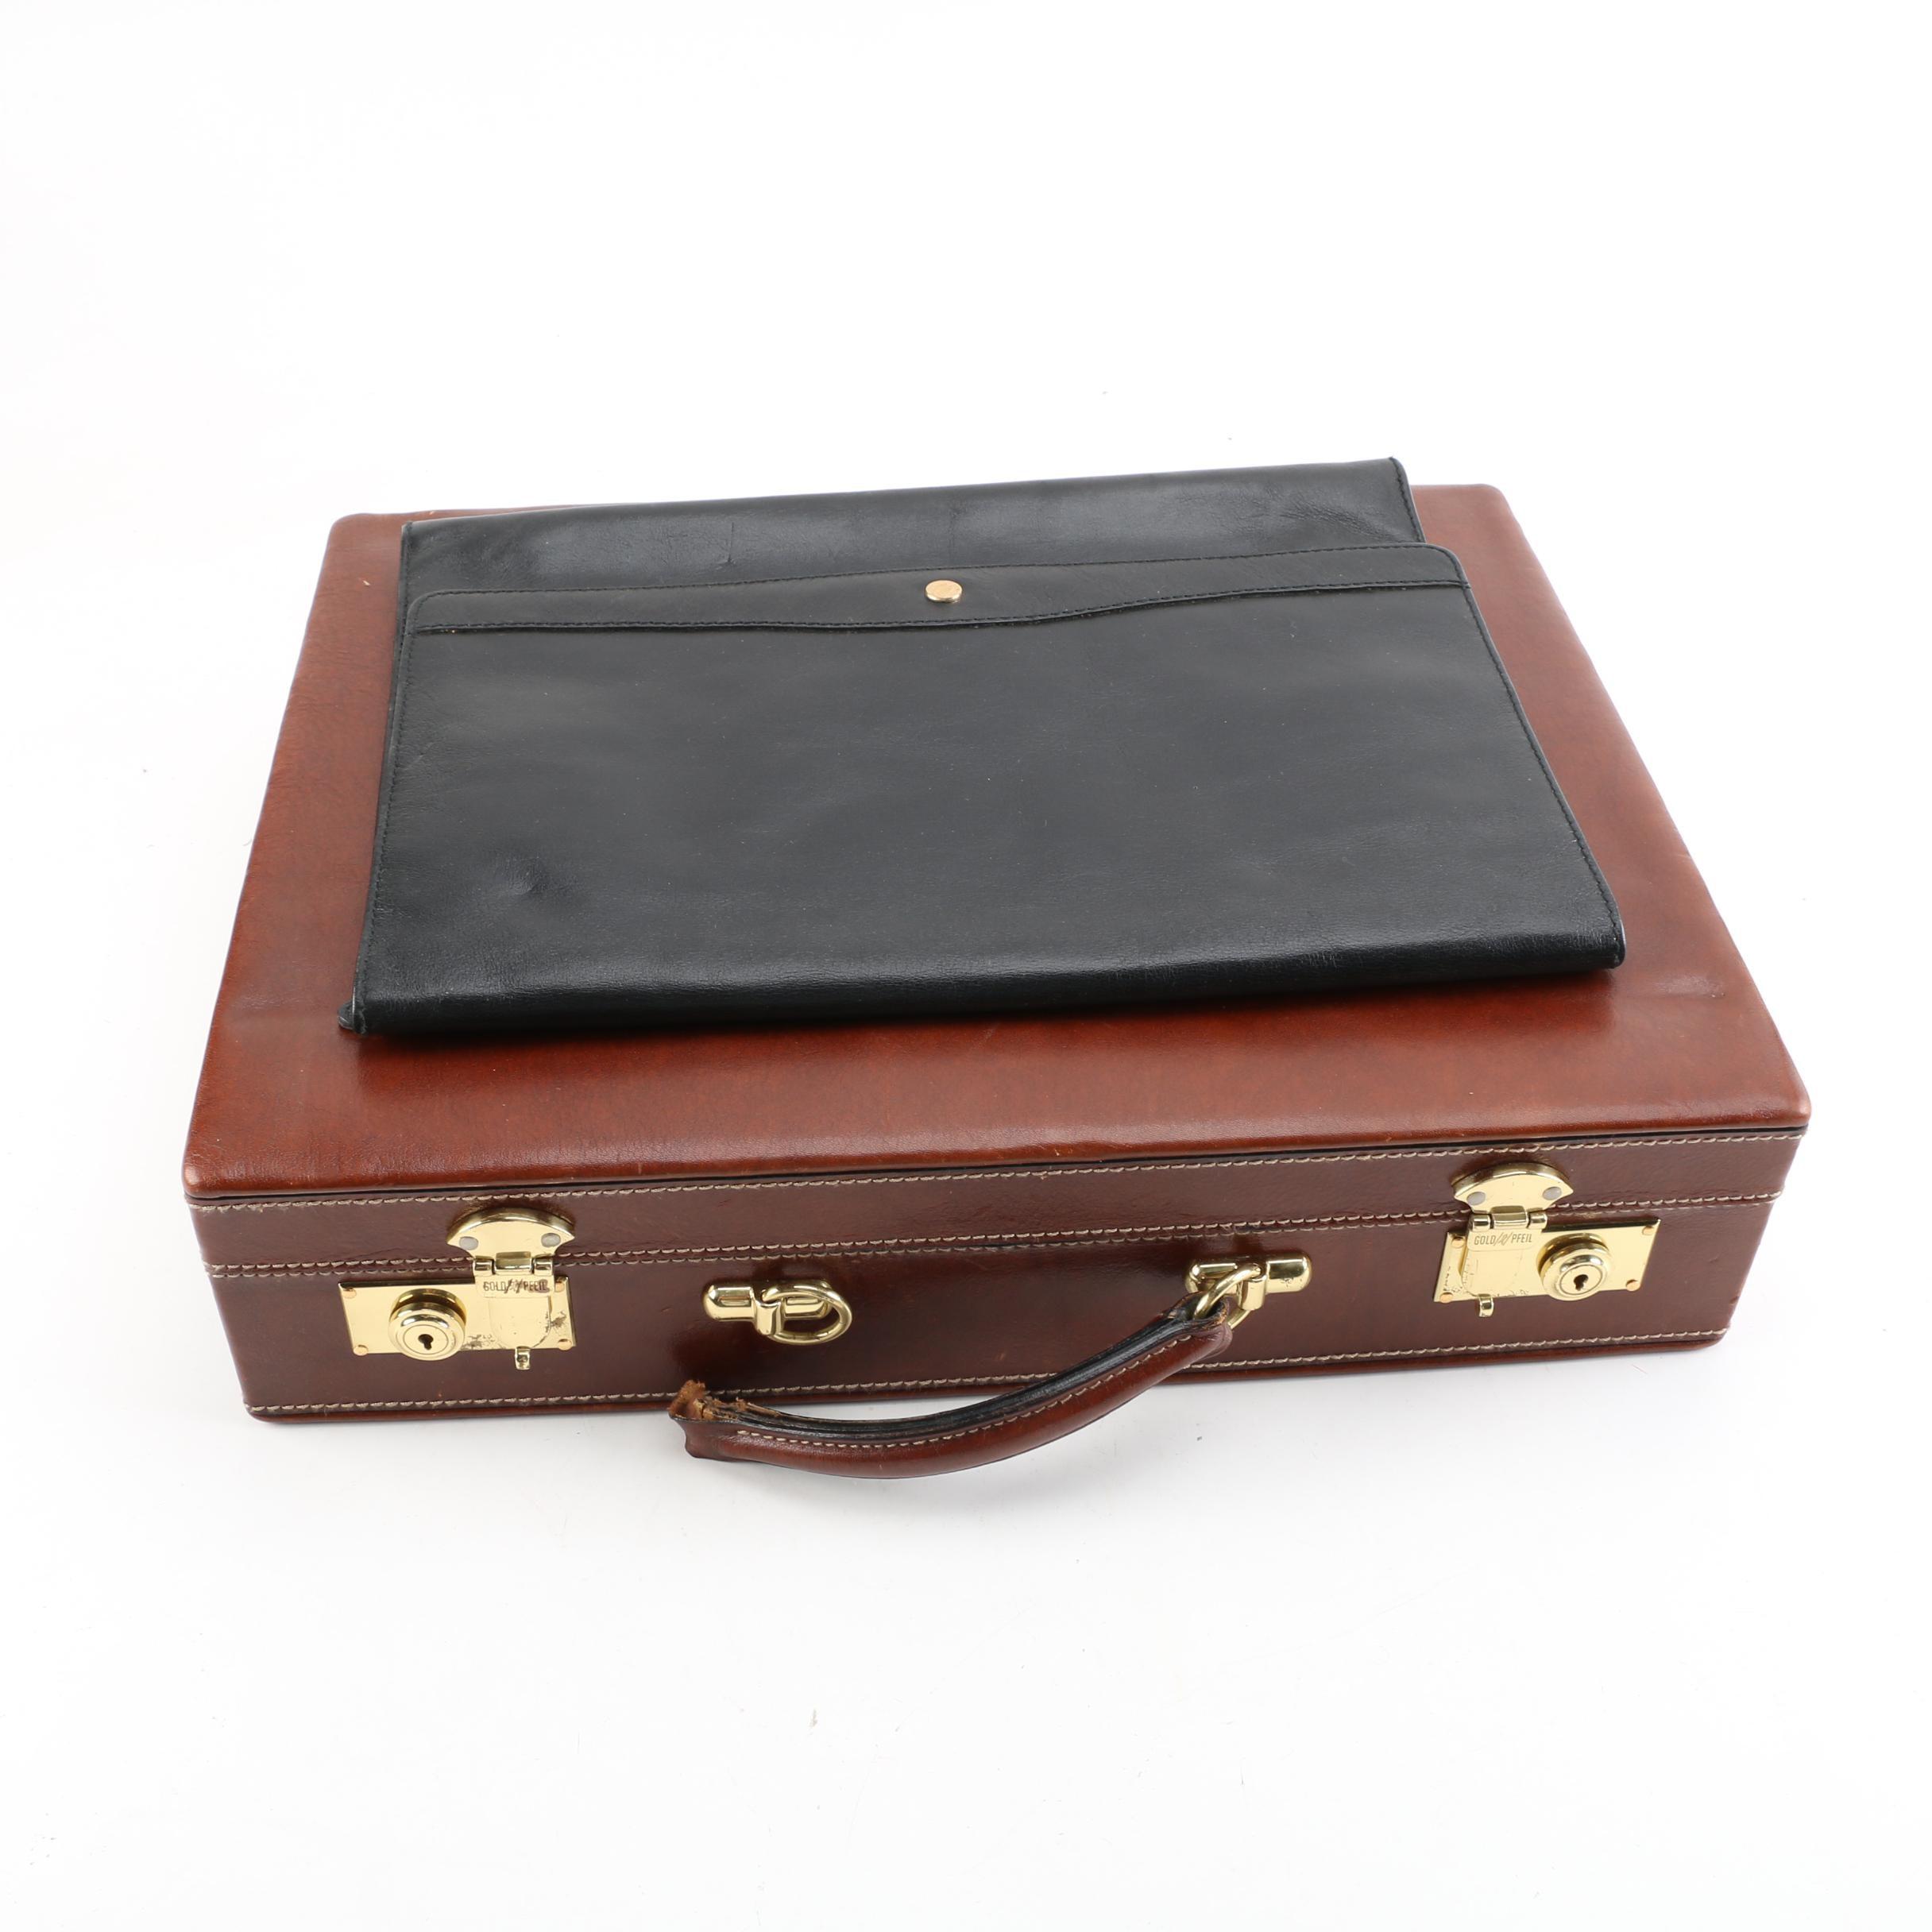 Vintage Goldpfeil Leather Briefcase and Messenger Case